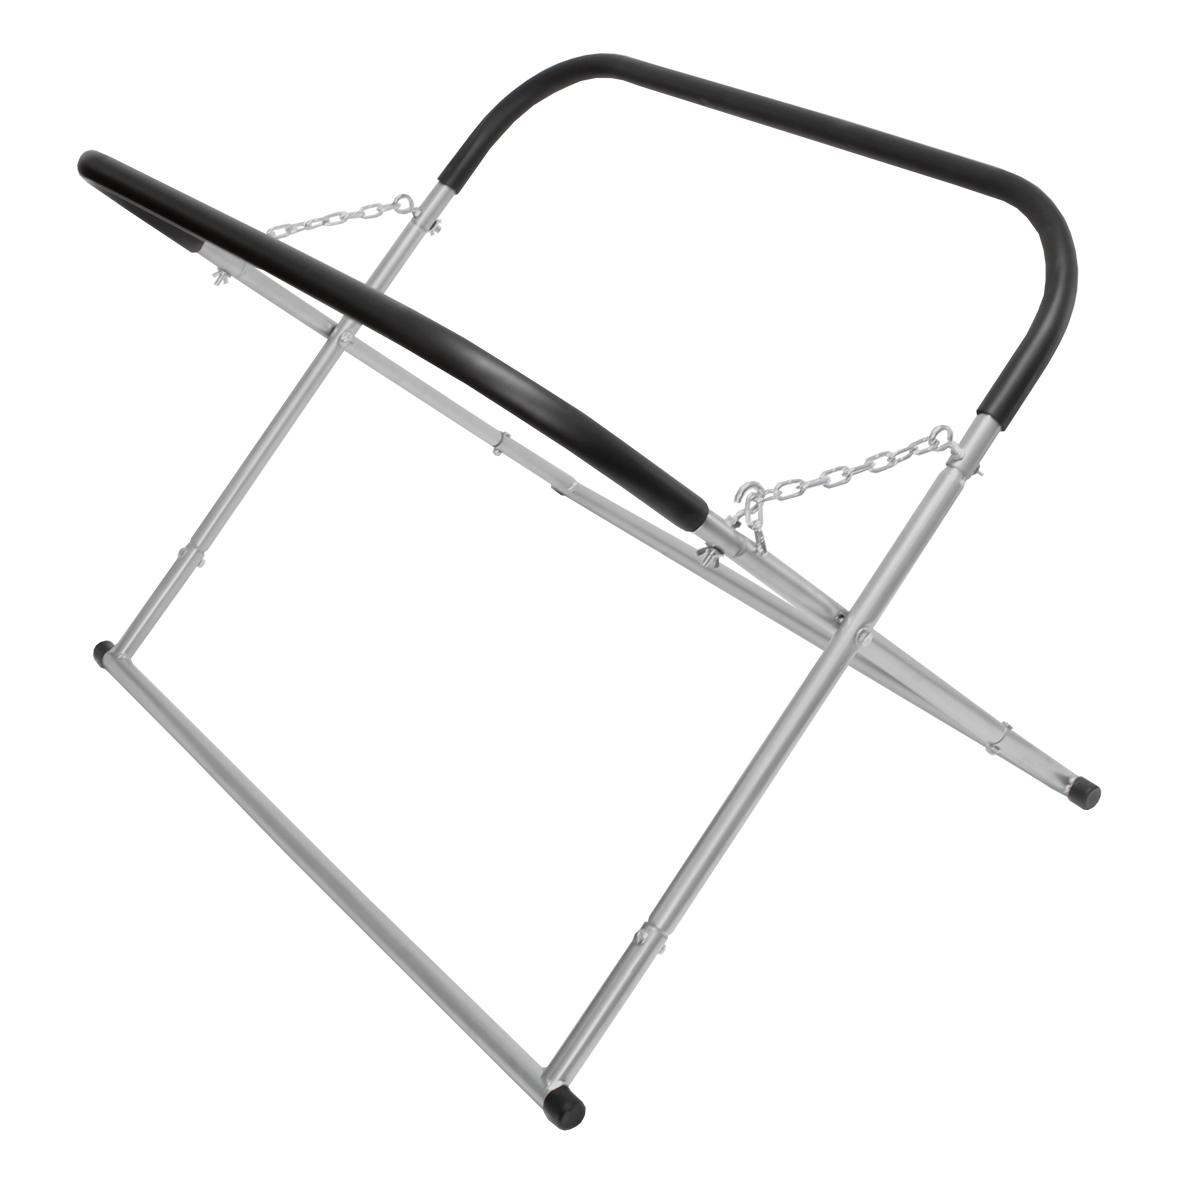 Bodyshop Universal Foldaway Trestle Bumper Panel Stand